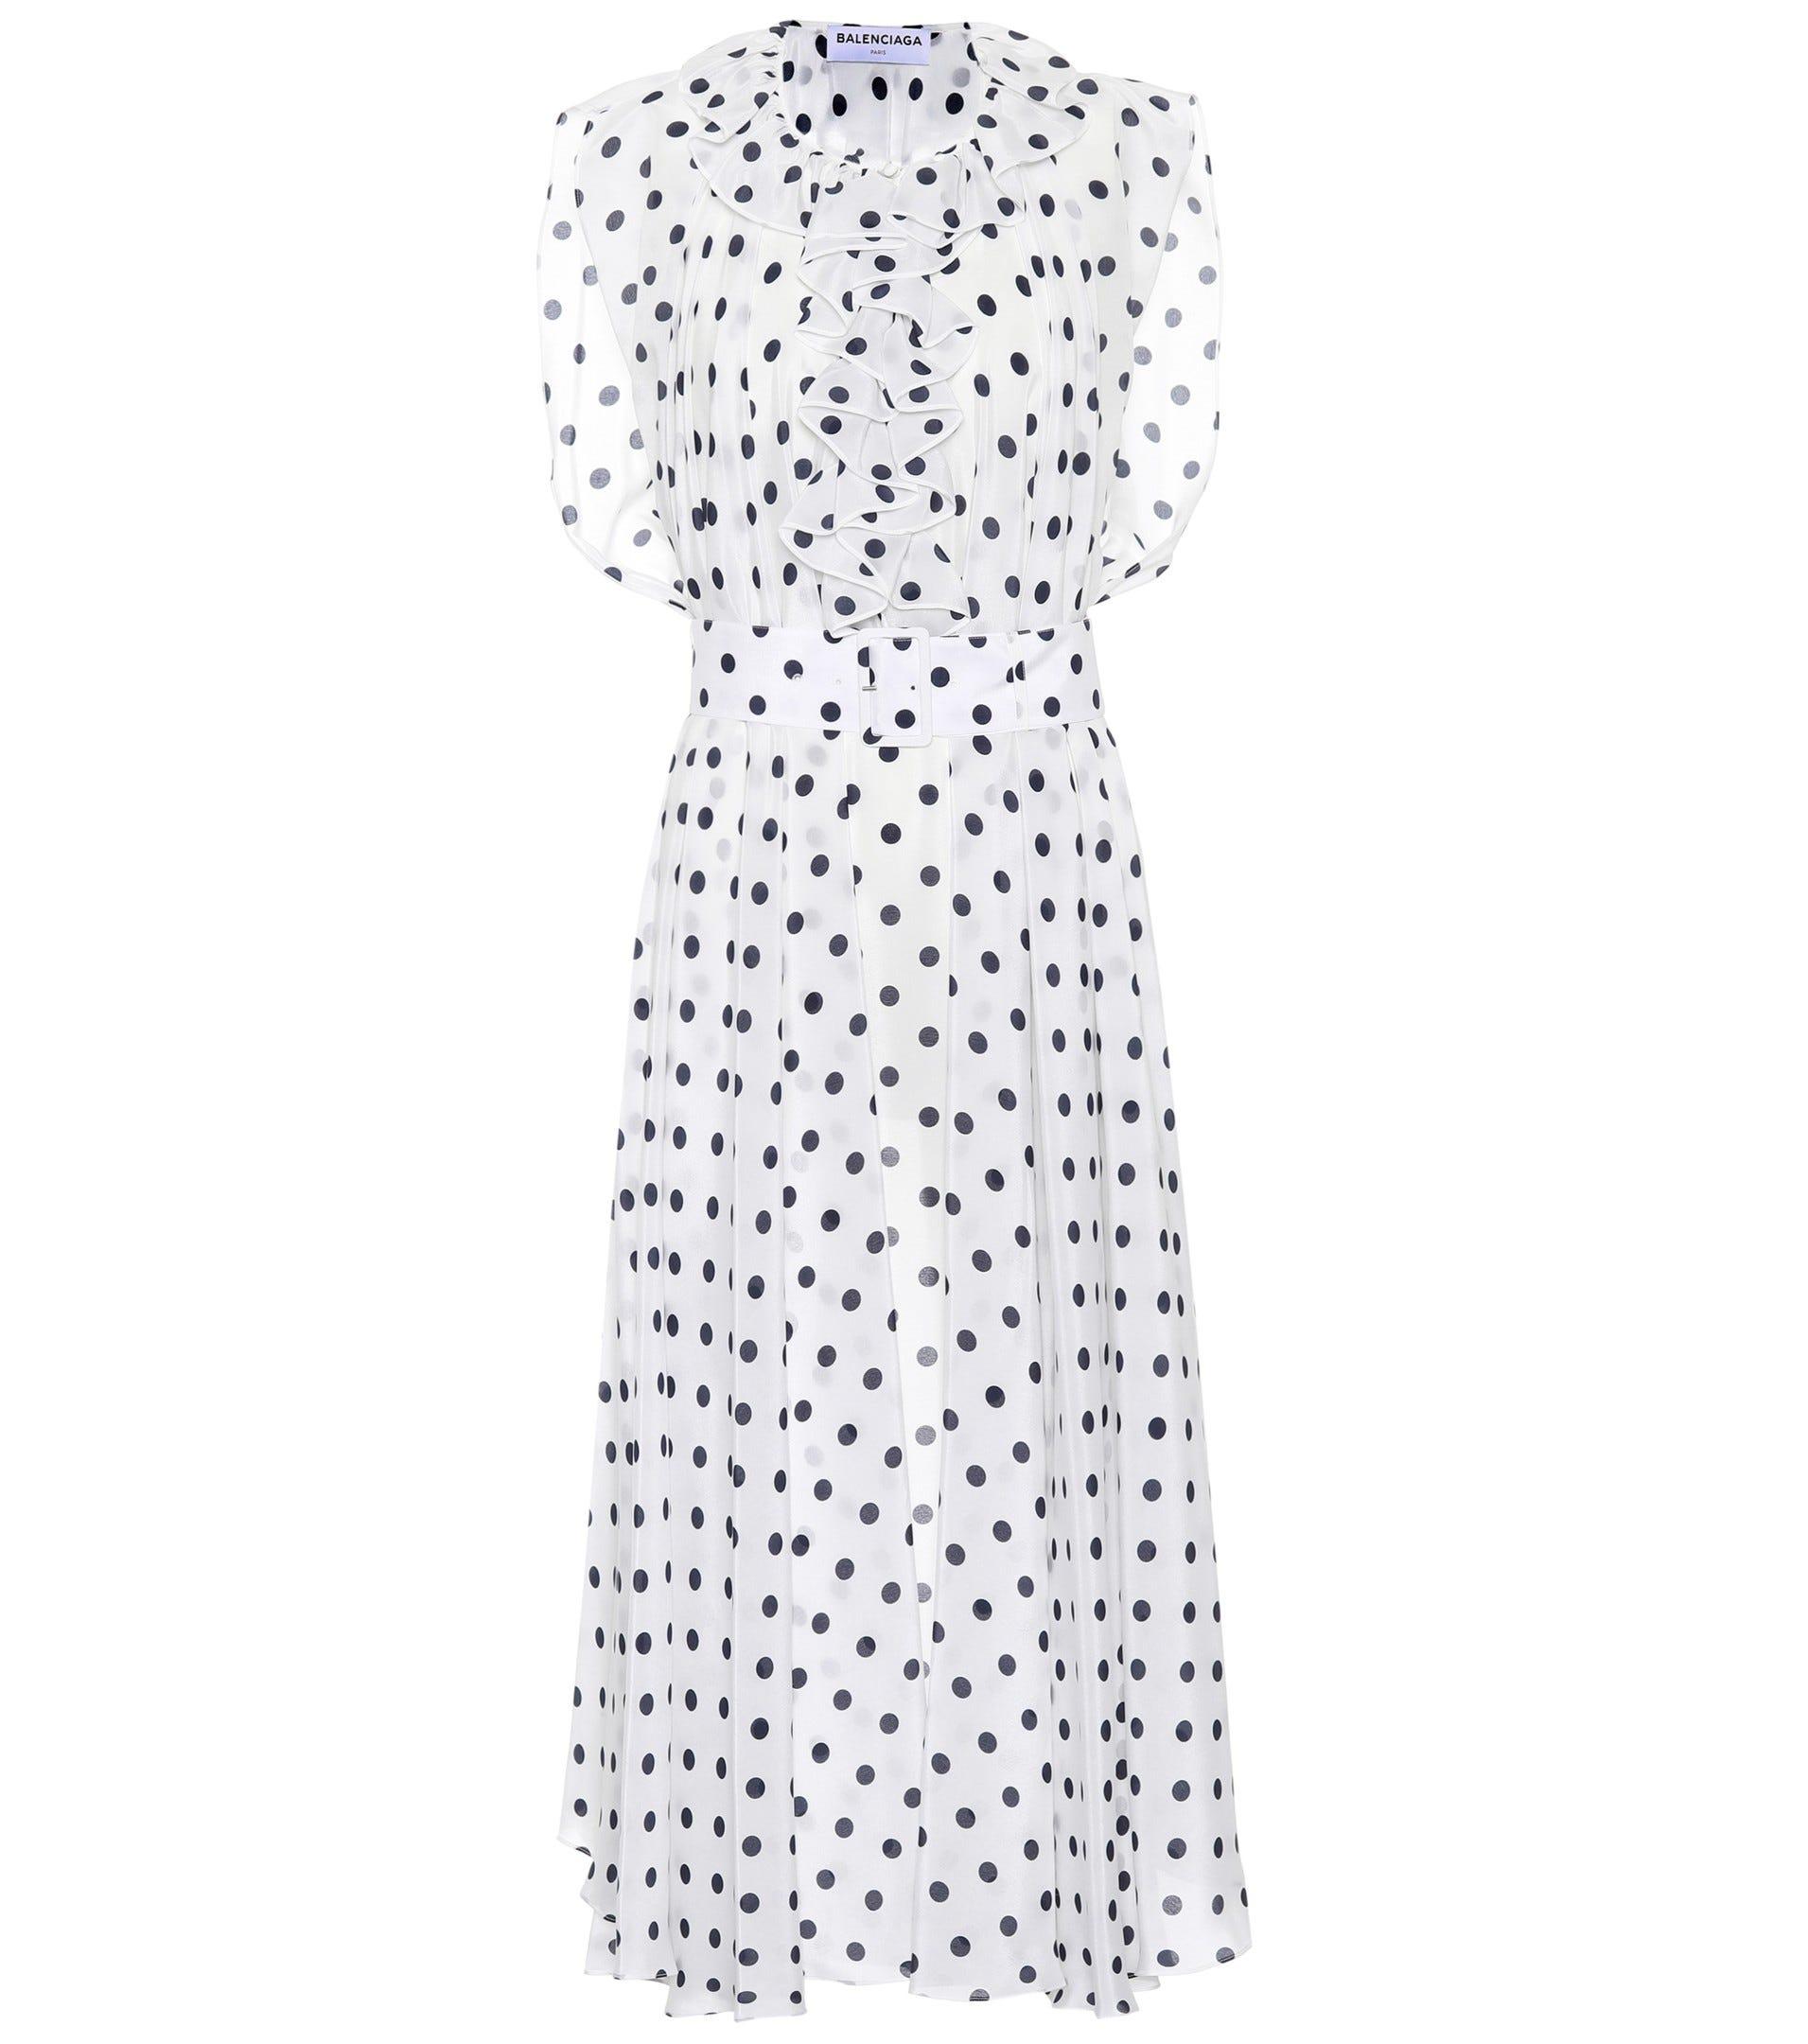 d677427d11f4f Cute Ways To Wear The Polka Dot Trend Winter 2018